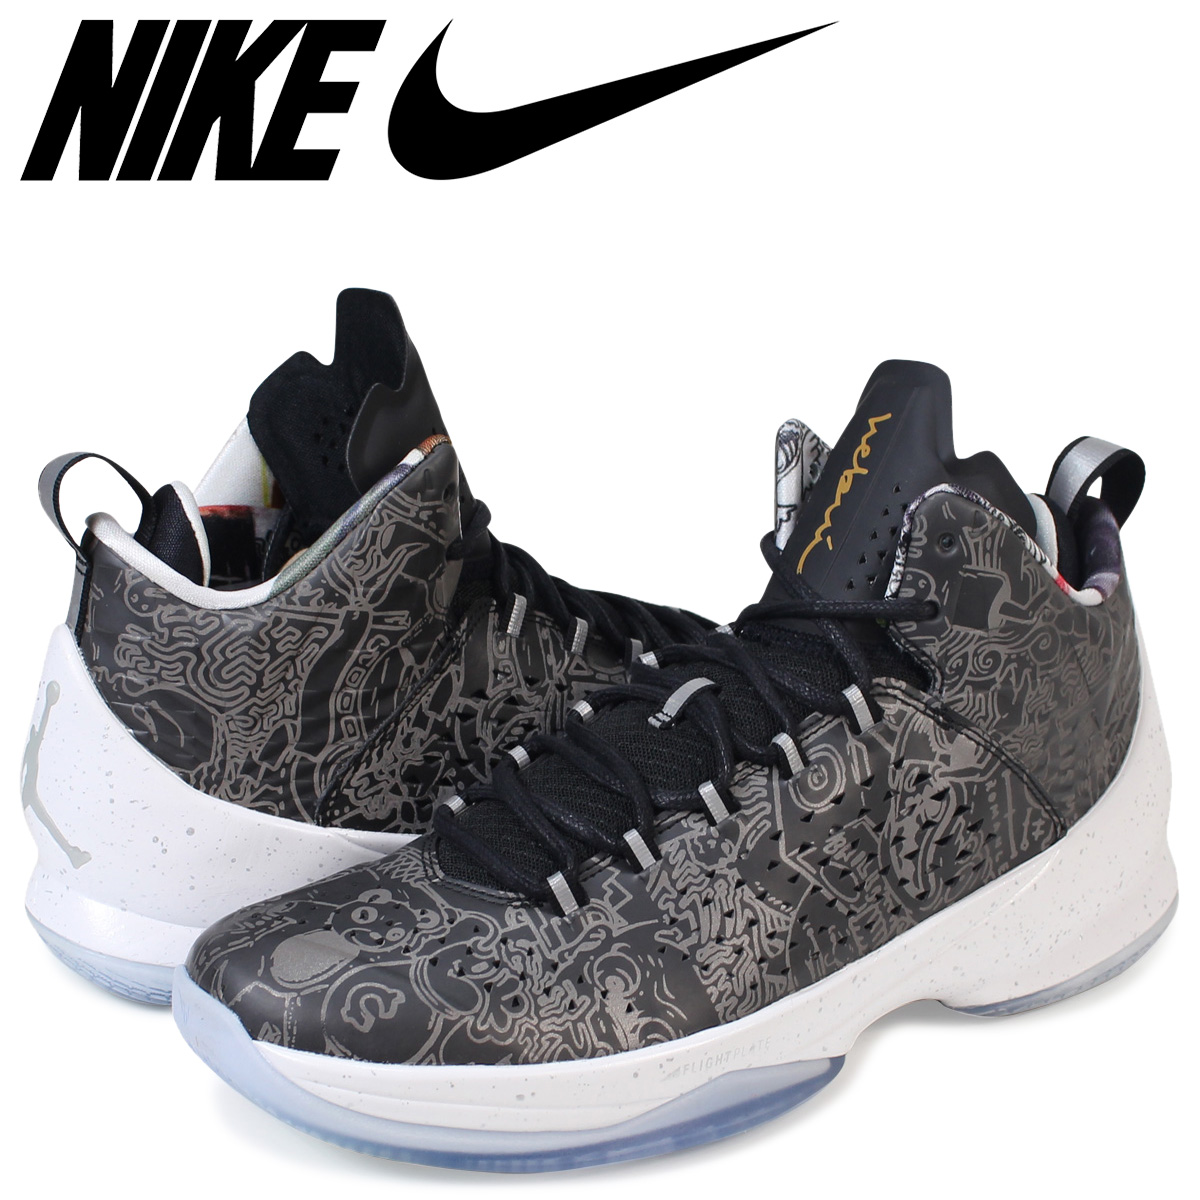 best website a5aec dd5ed ... free shipping nike nike air jordan melo sneakers air jordan melo m11  hebru 814286 050 mens